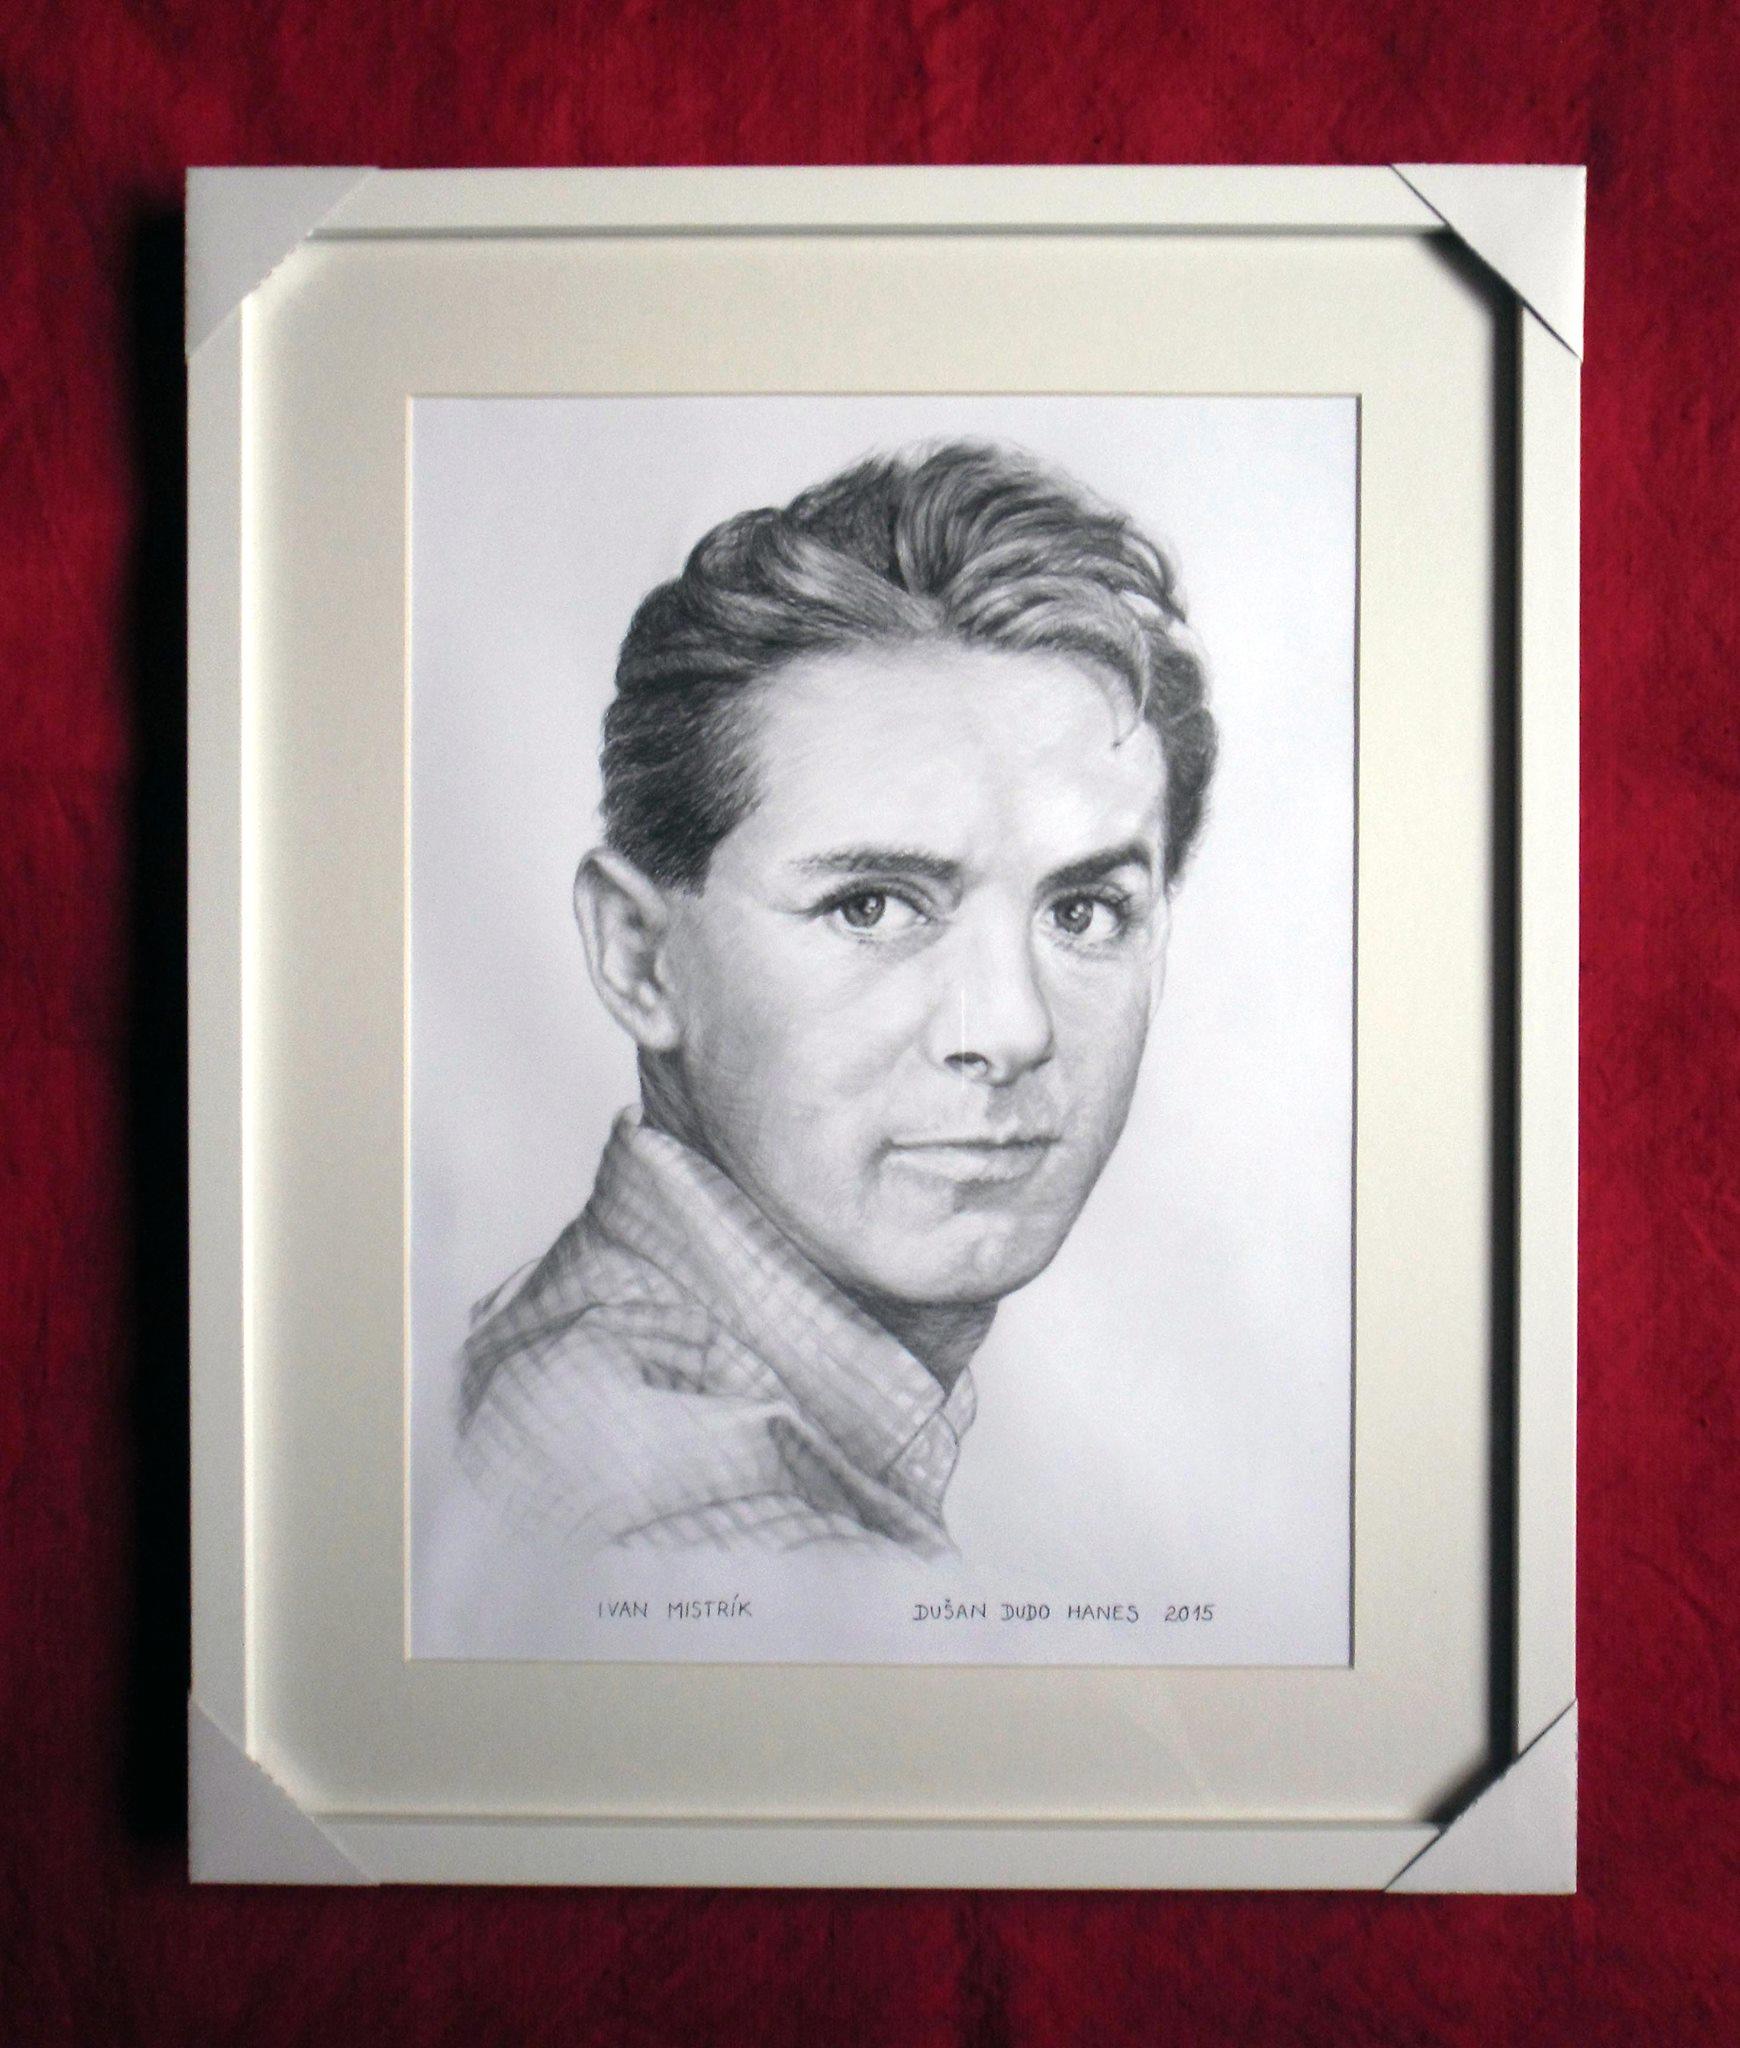 228 - Ivan Mistrík. Portrét v ráme, Dušan Dudo Hanes